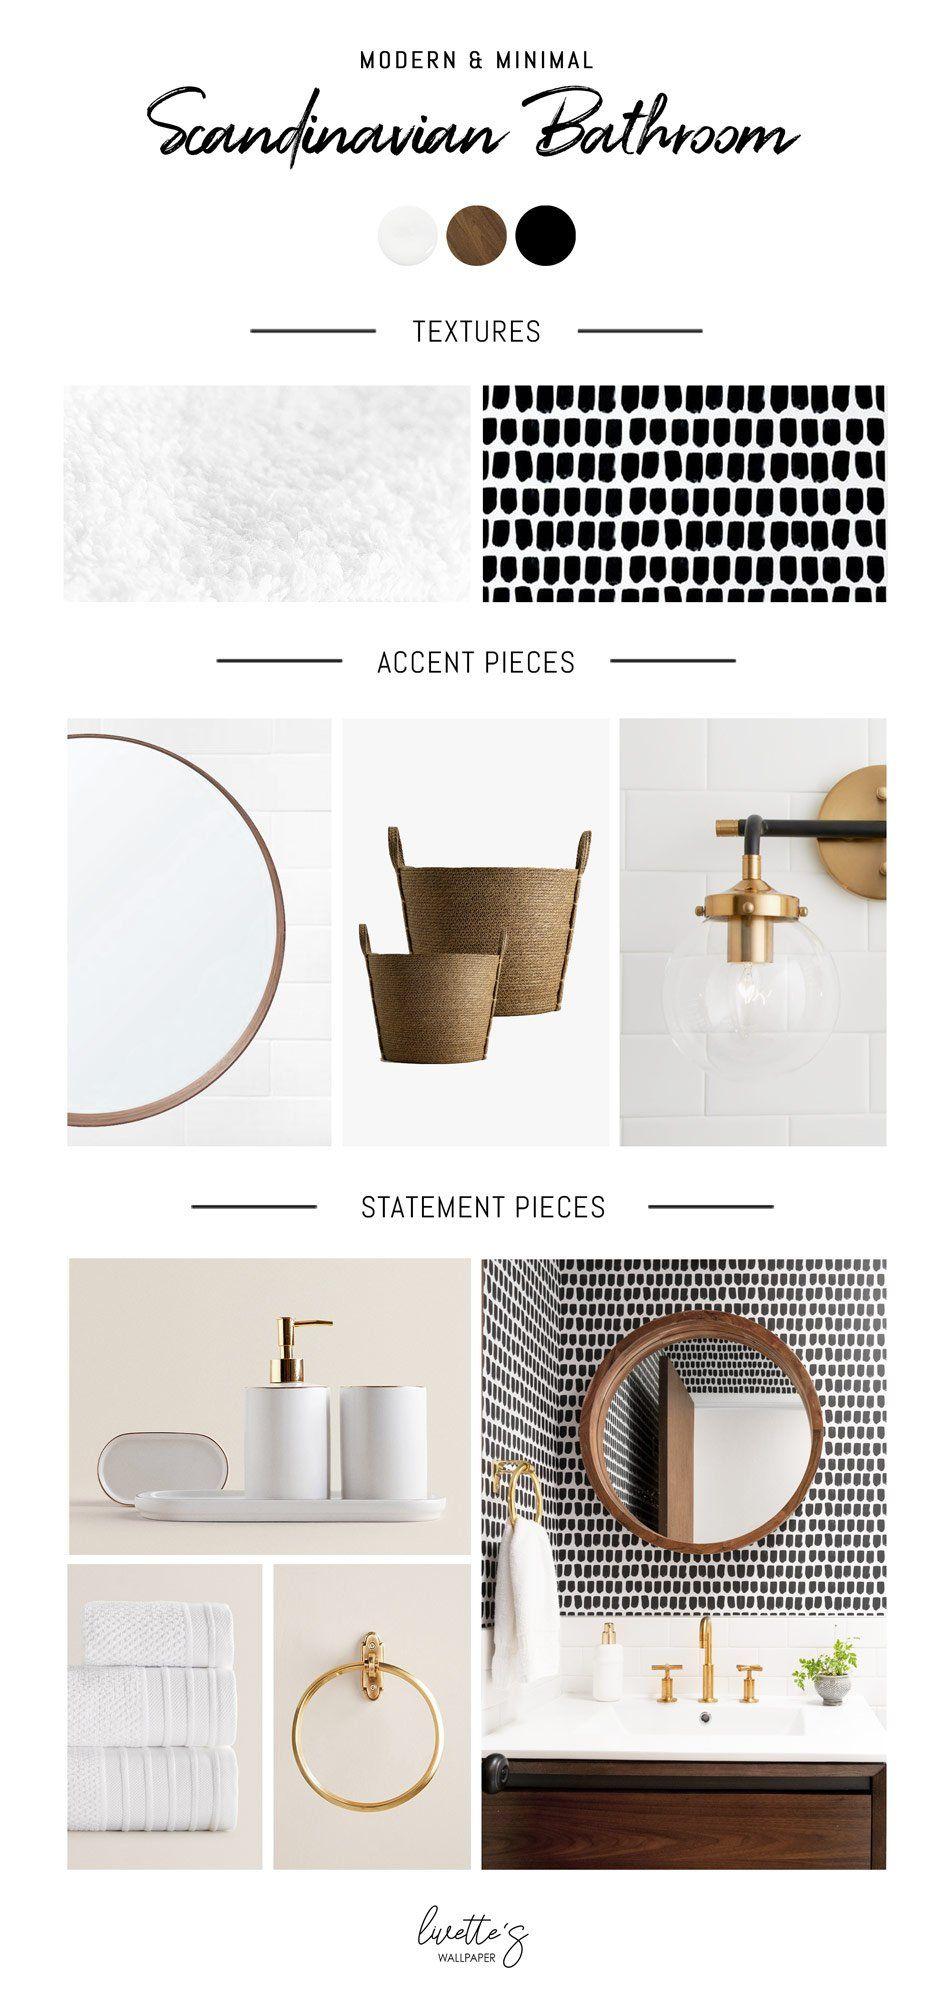 Photo of Modernes & minimales skandinavisches Badezimmer | Mood Board Montag